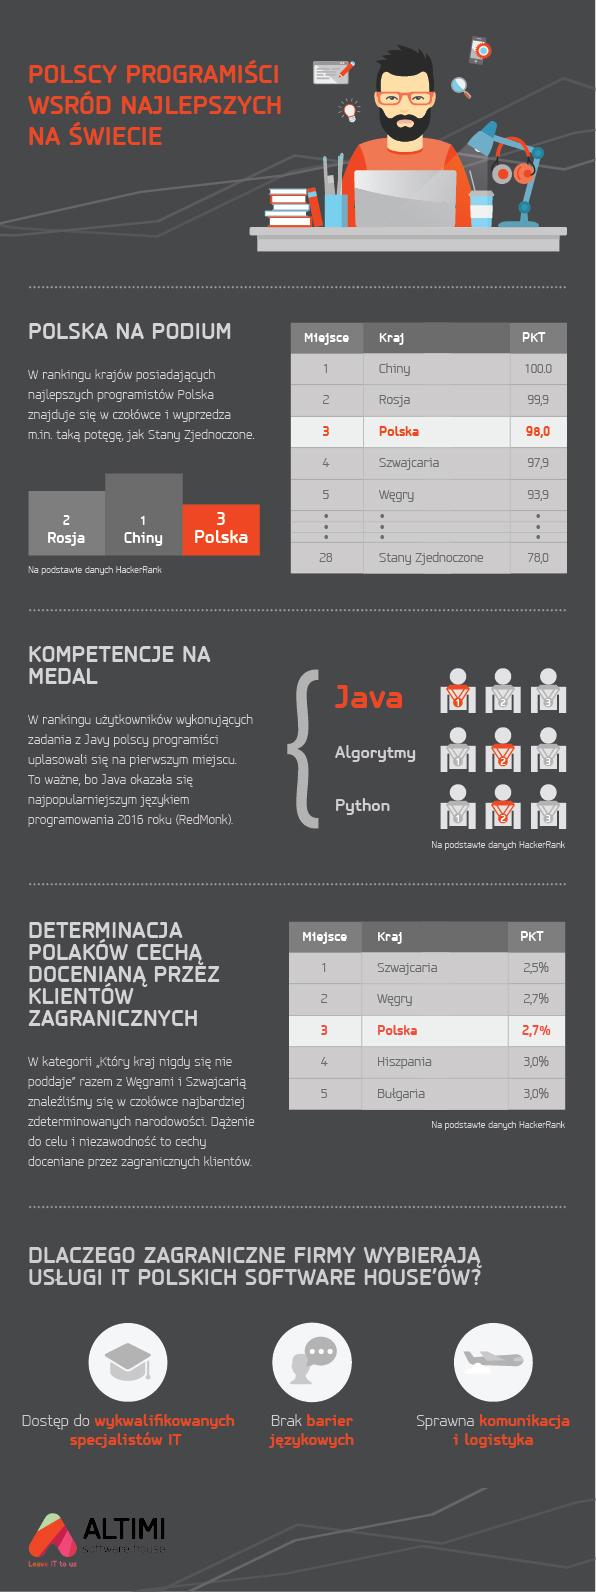 programisci Altimi